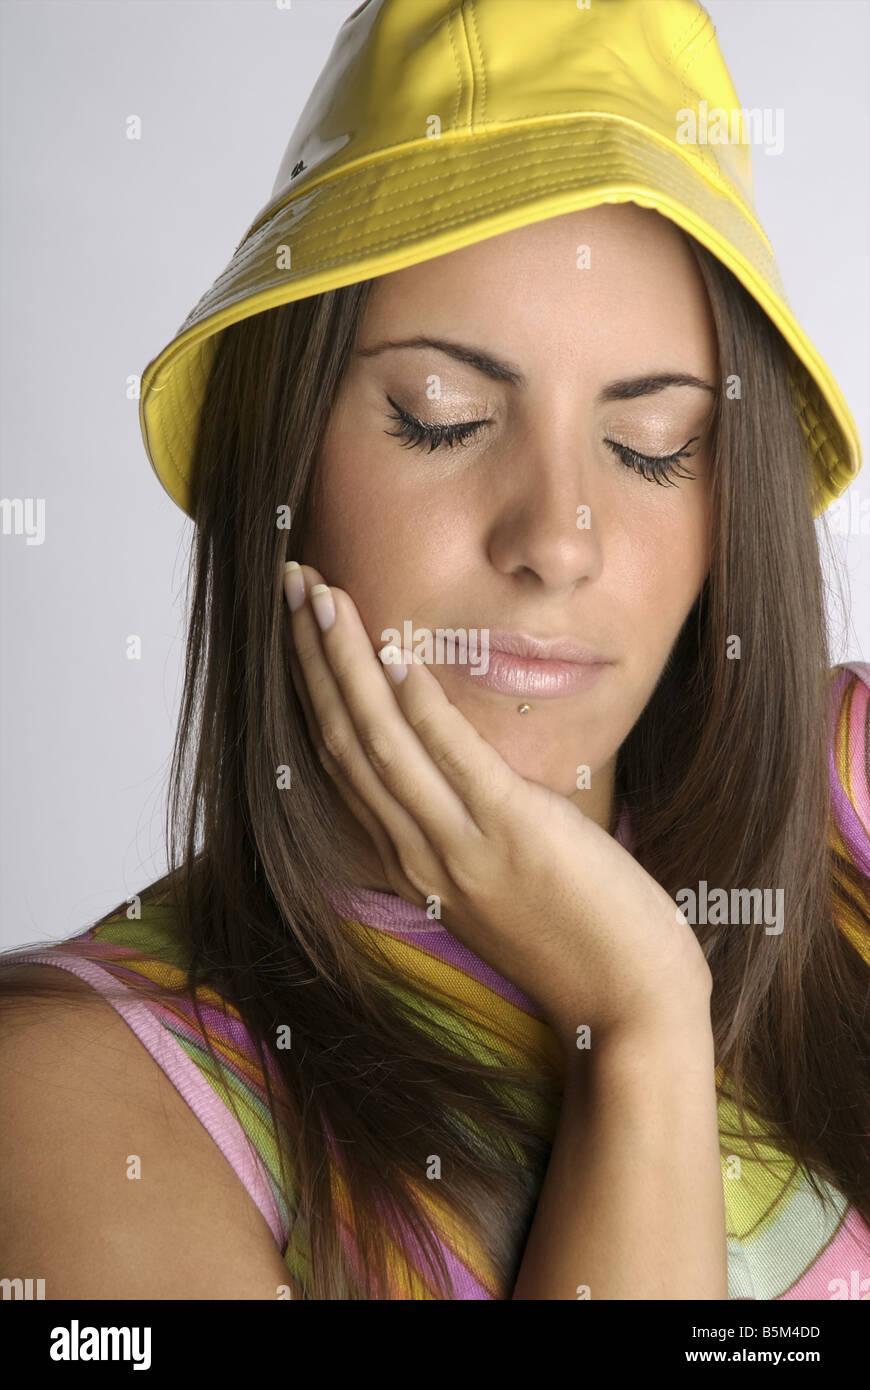 Female brunette with long hair. - Stock Image